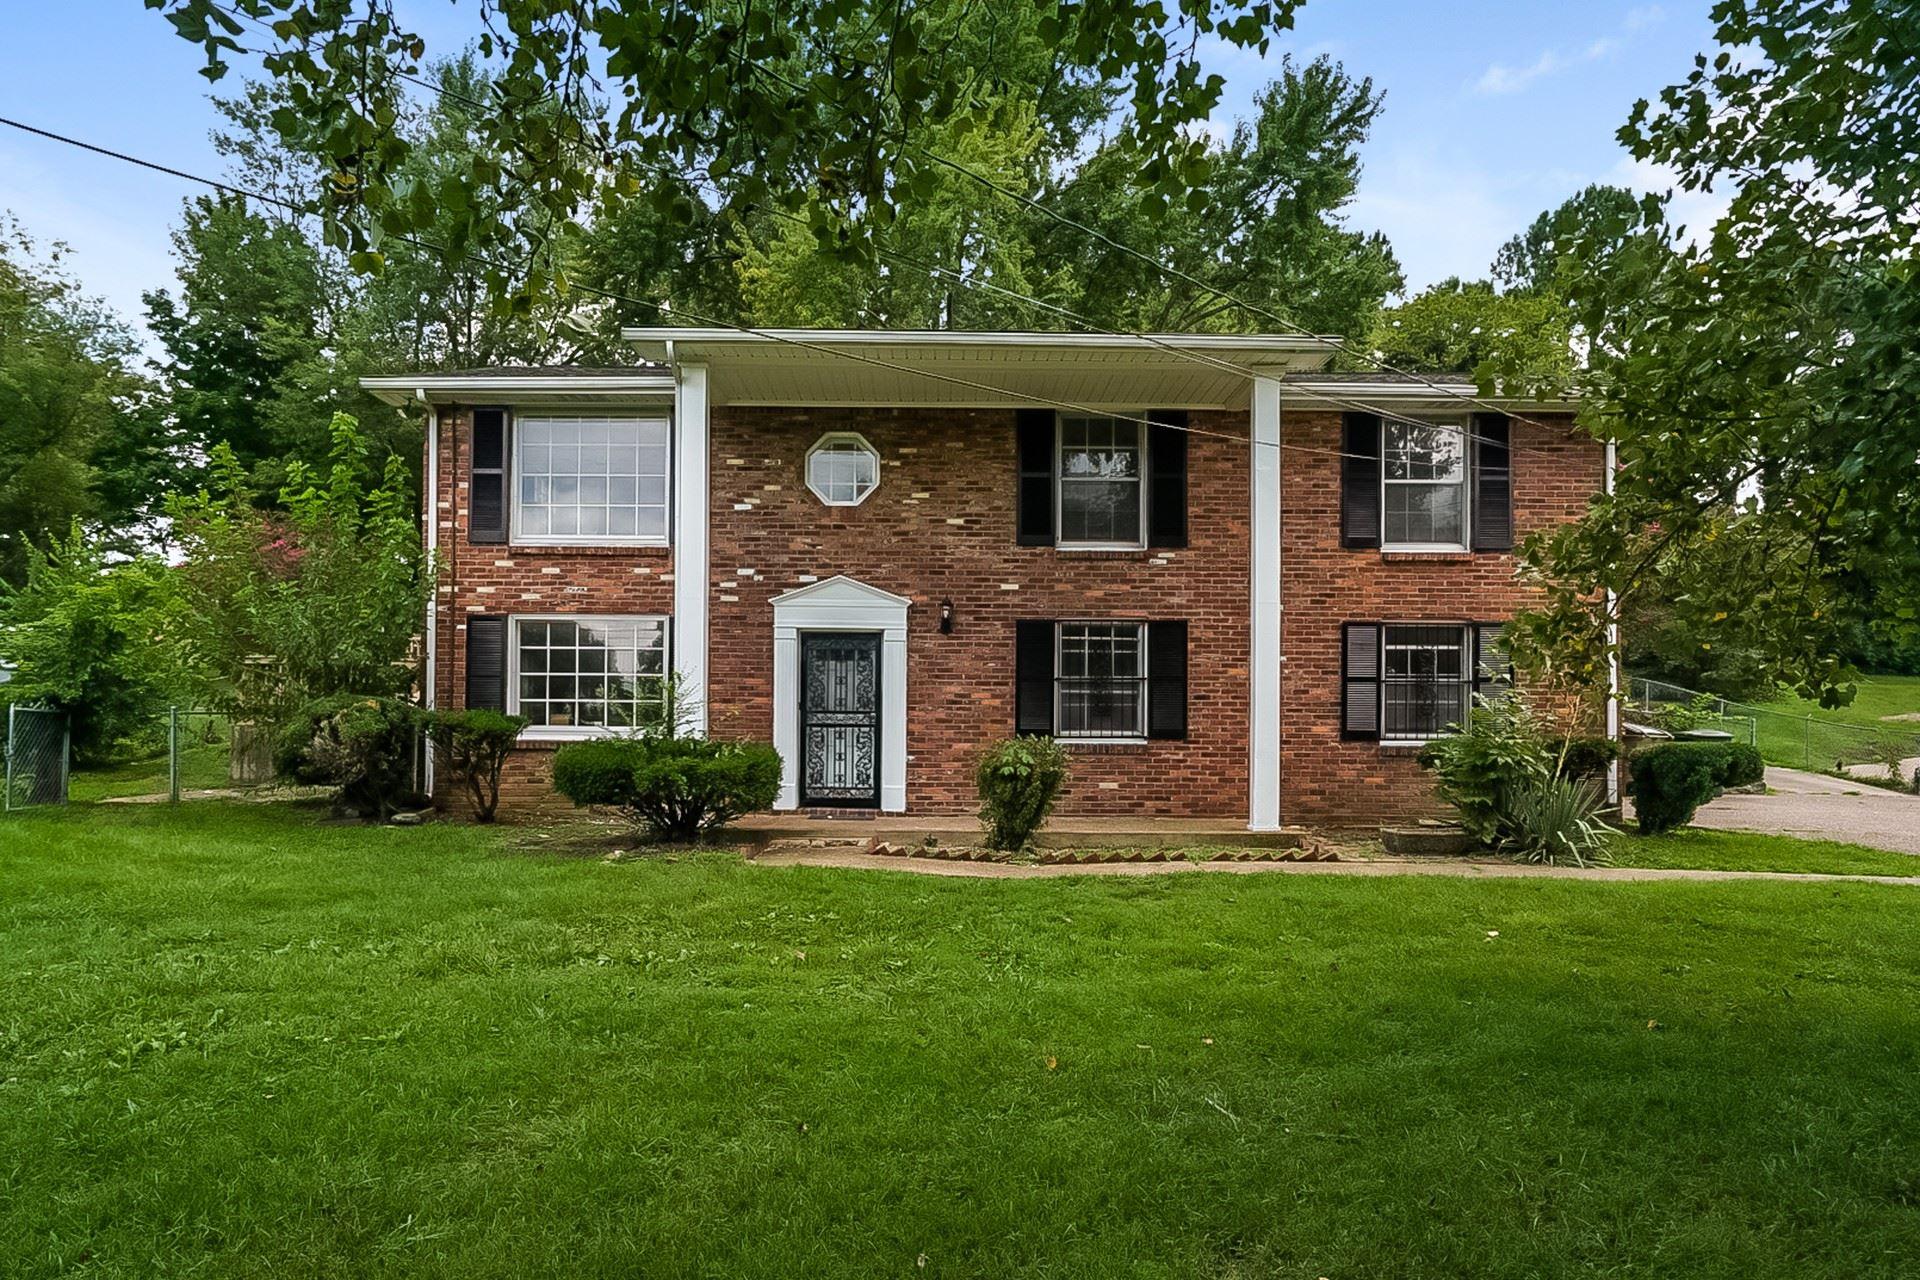 414 Broadmoor Dr, Nashville, TN 37216 - MLS#: 2284933